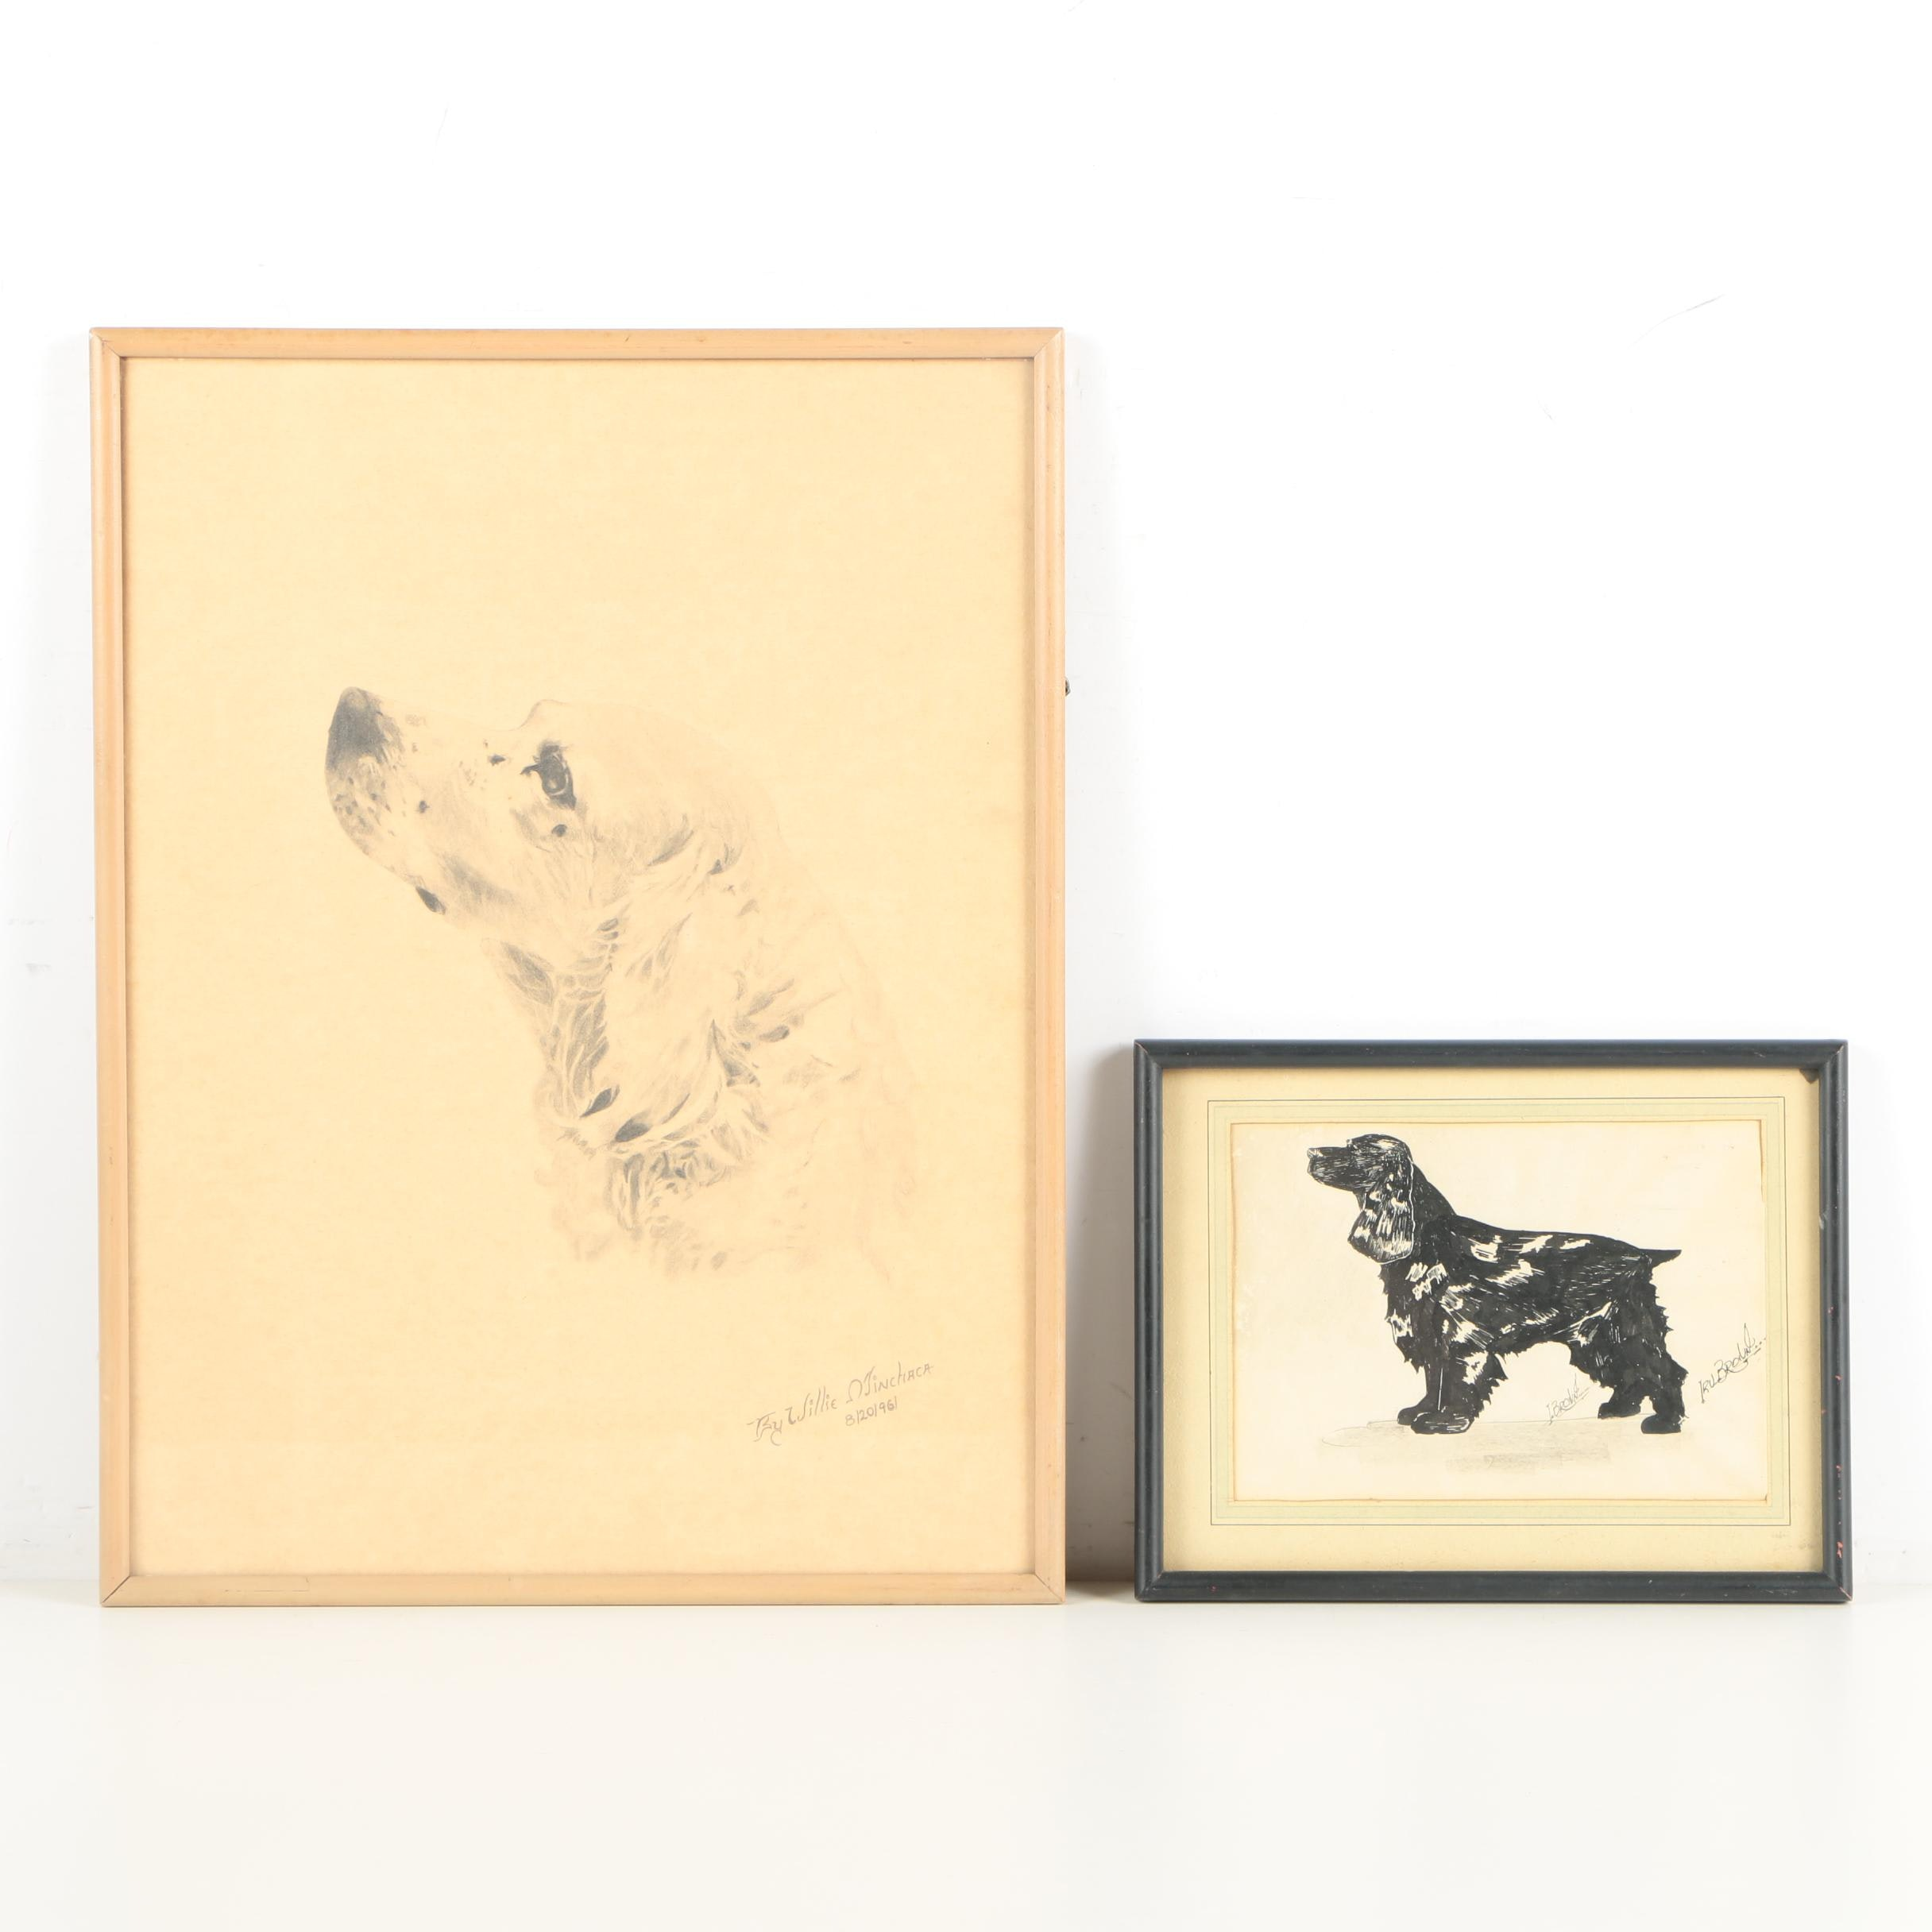 Irv Brown and Willie Minchaca Drawings of Cocker Spaniels